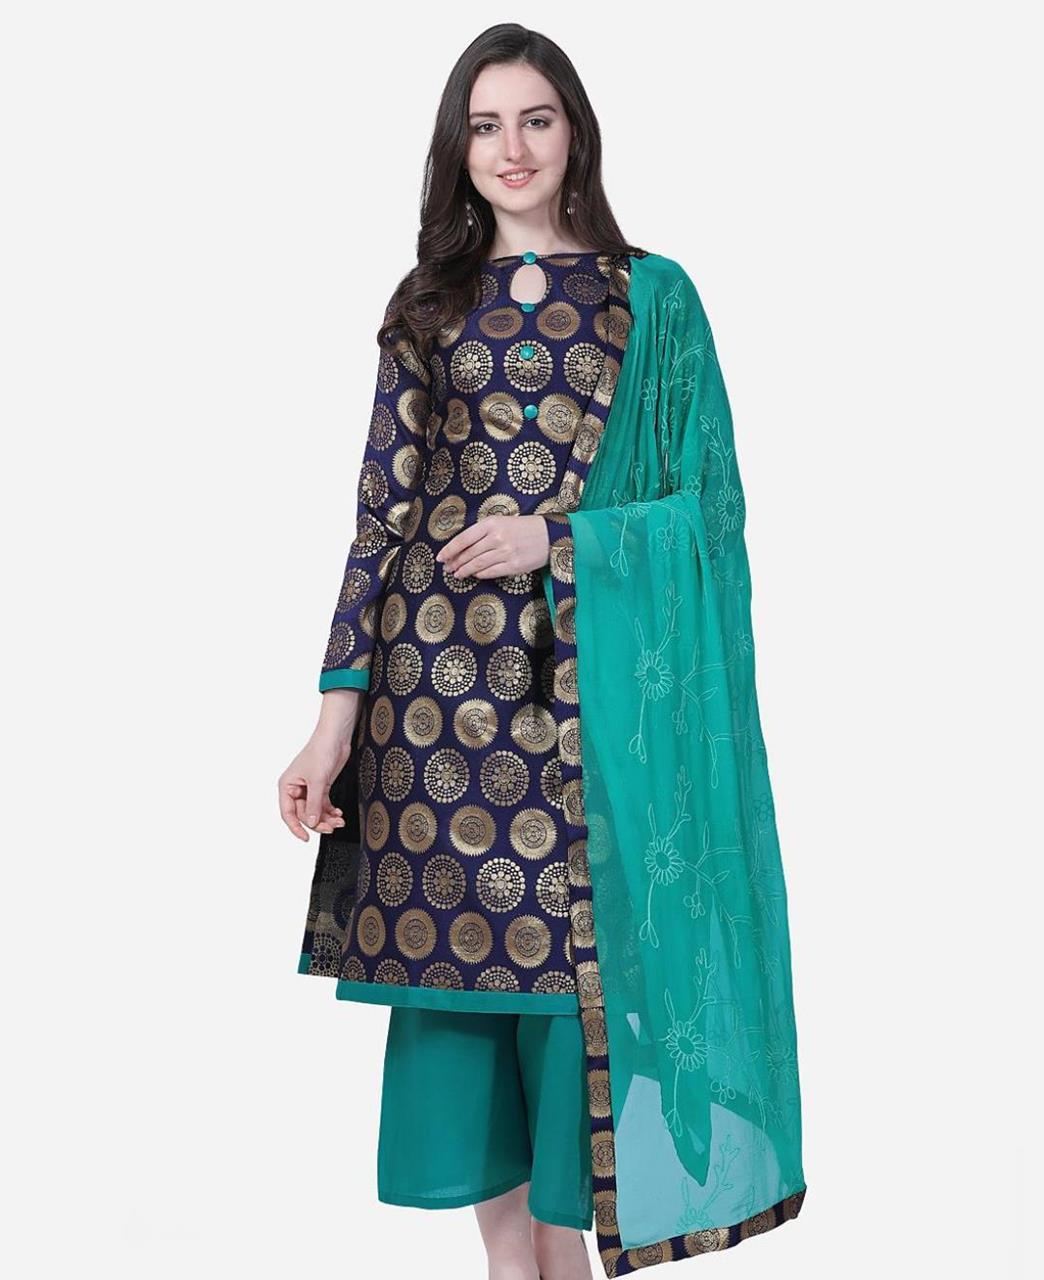 Embroidered Cotton Straight cut Salwar Kameez in Navy Blue